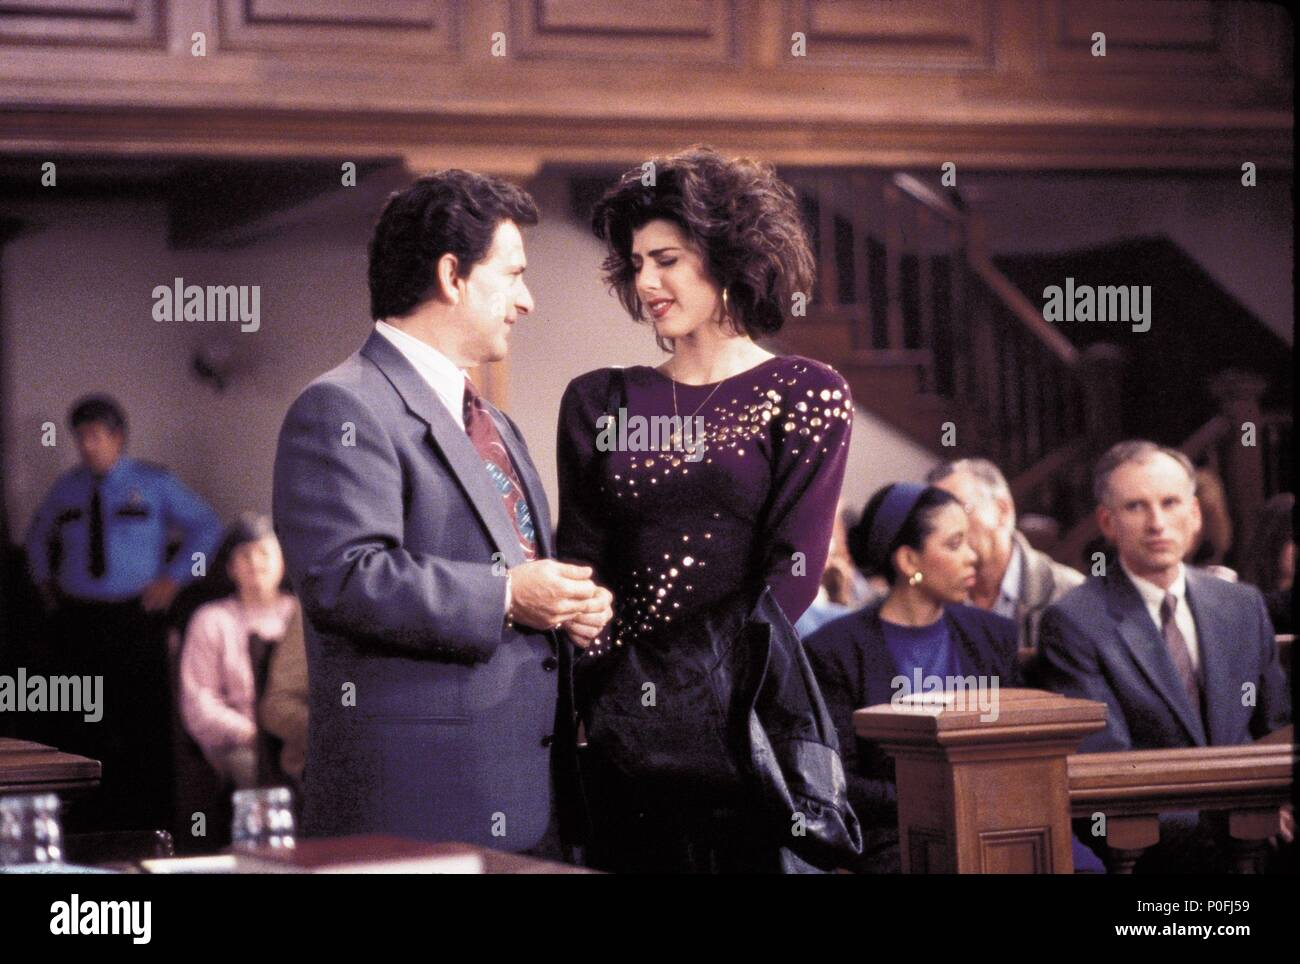 Original Film Title: MY COUSIN VINNY.  English Title: MY COUSIN VINNY.  Film Director: JONATHAN LYNN.  Year: 1992.  Stars: MARISA TOMEI; JOE PESCI. Credit: 20TH CENTURY FOX / GLASS, BEN / Album - Stock Image